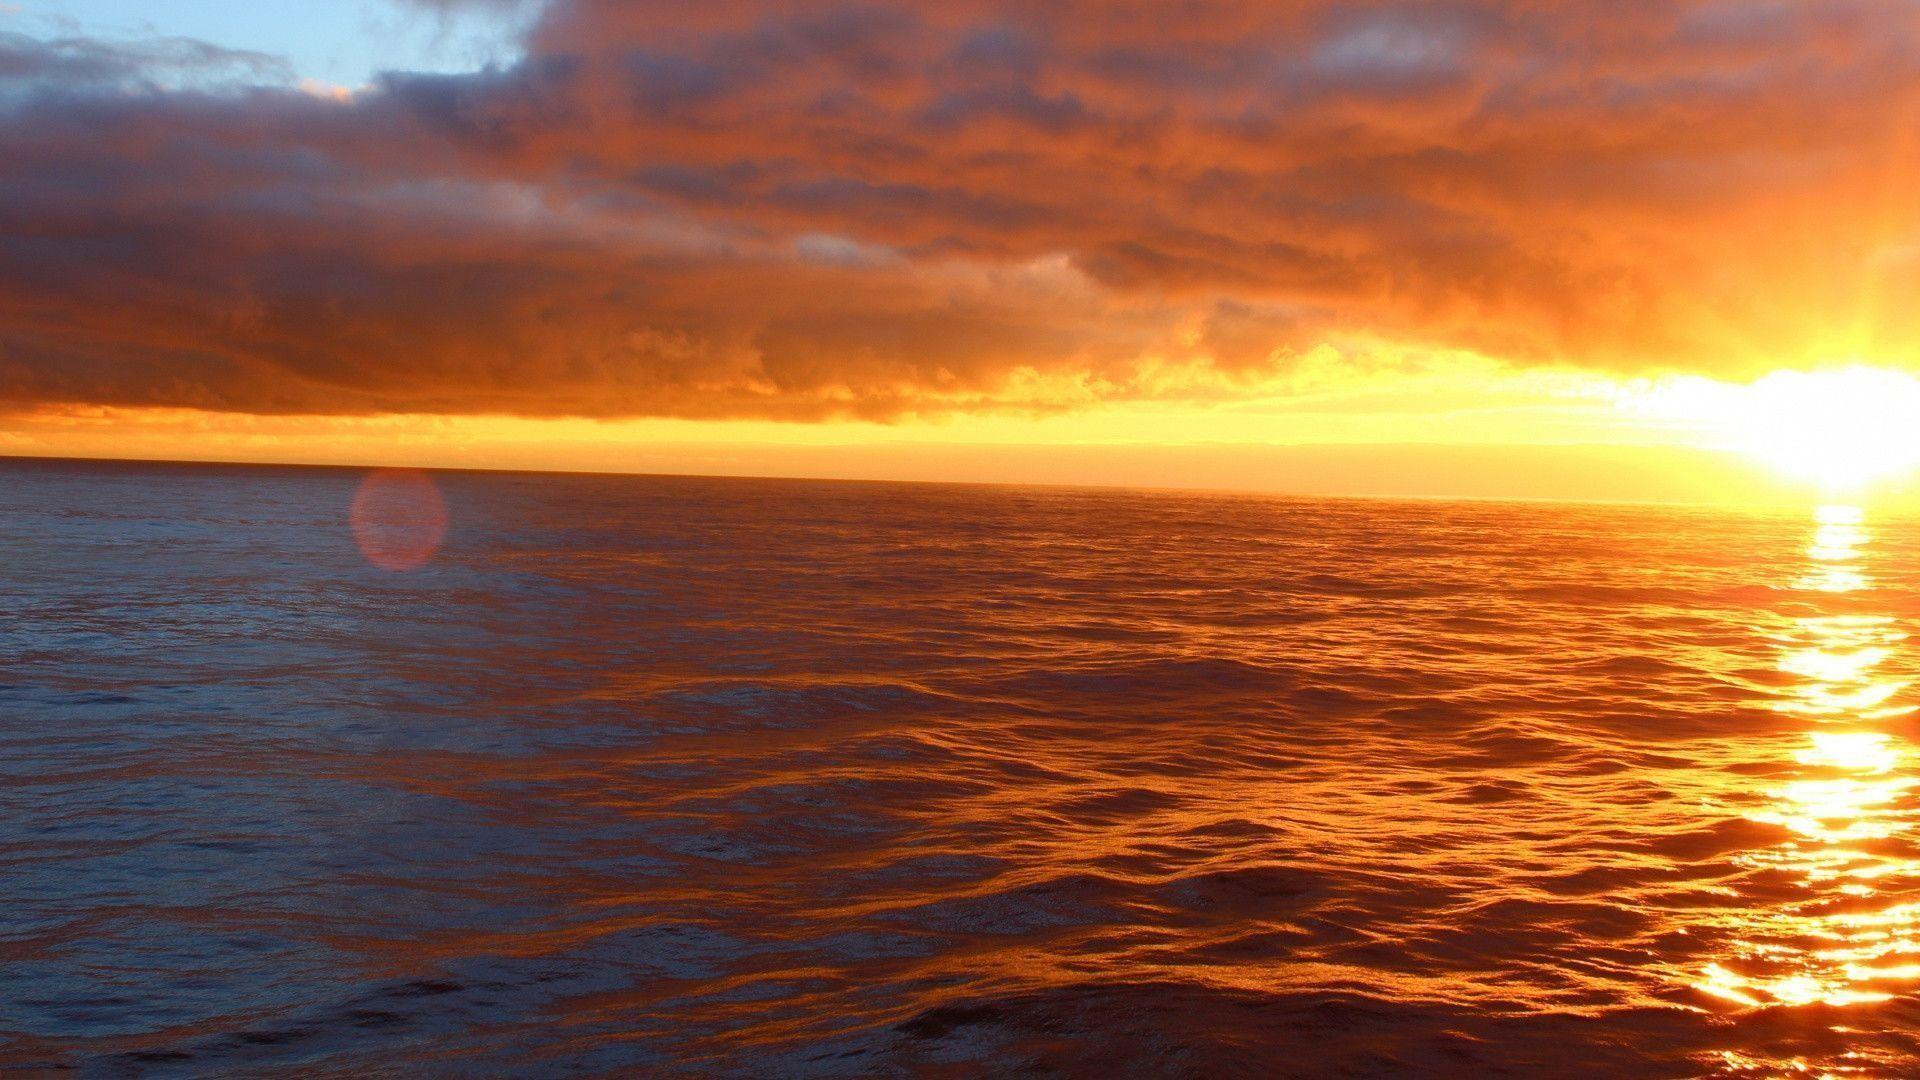 Res: 1920x1080, Ocean Sunset wallpaper - 905176